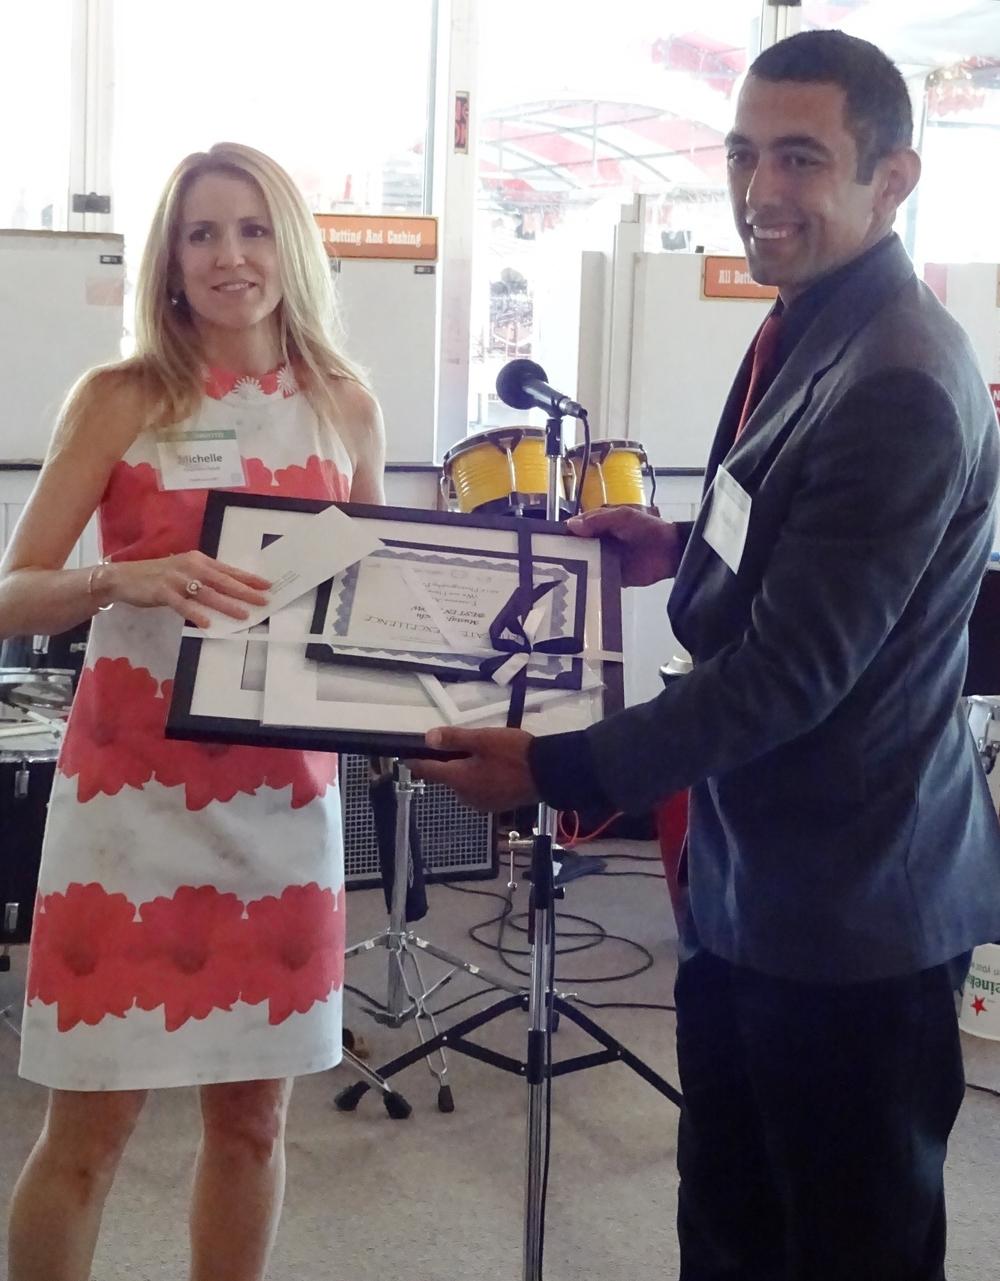 Michelle Paquette-Deuel congratulates 1st place winner Mustafa Guclu